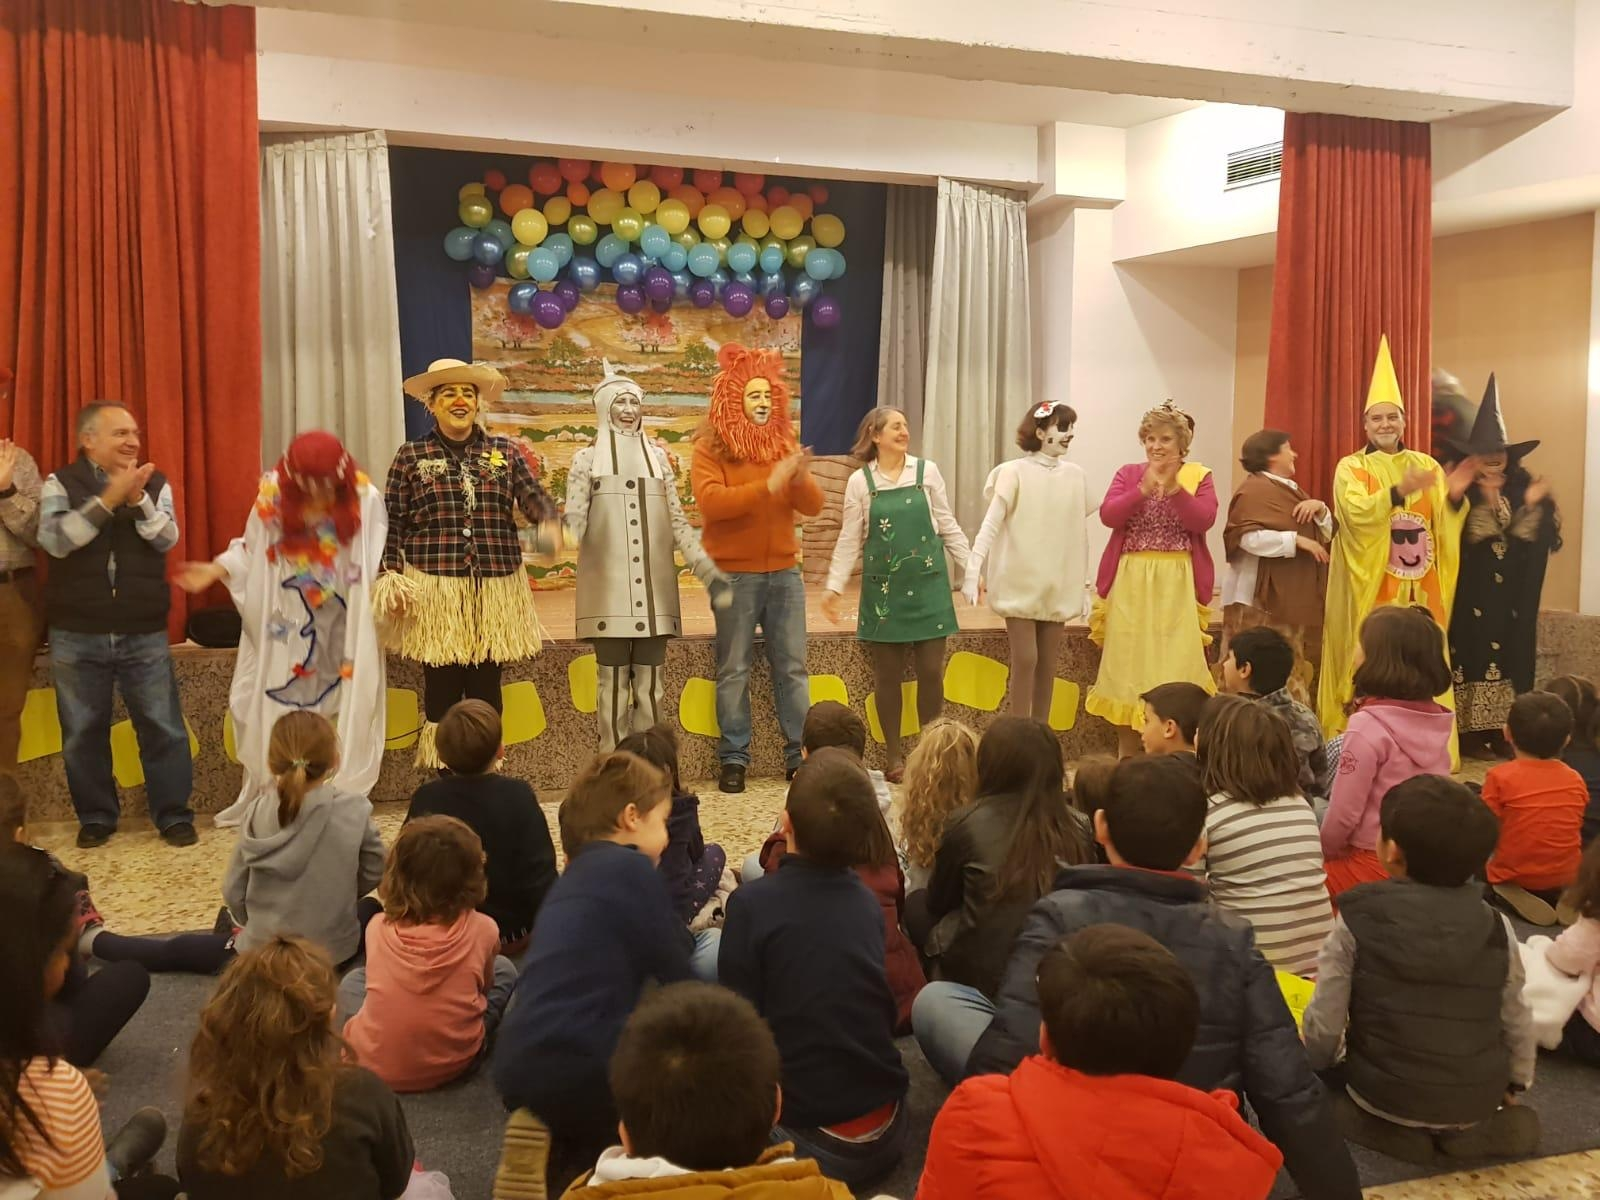 teatro-sange-mago-de-oz-2019-reyes-magos-5